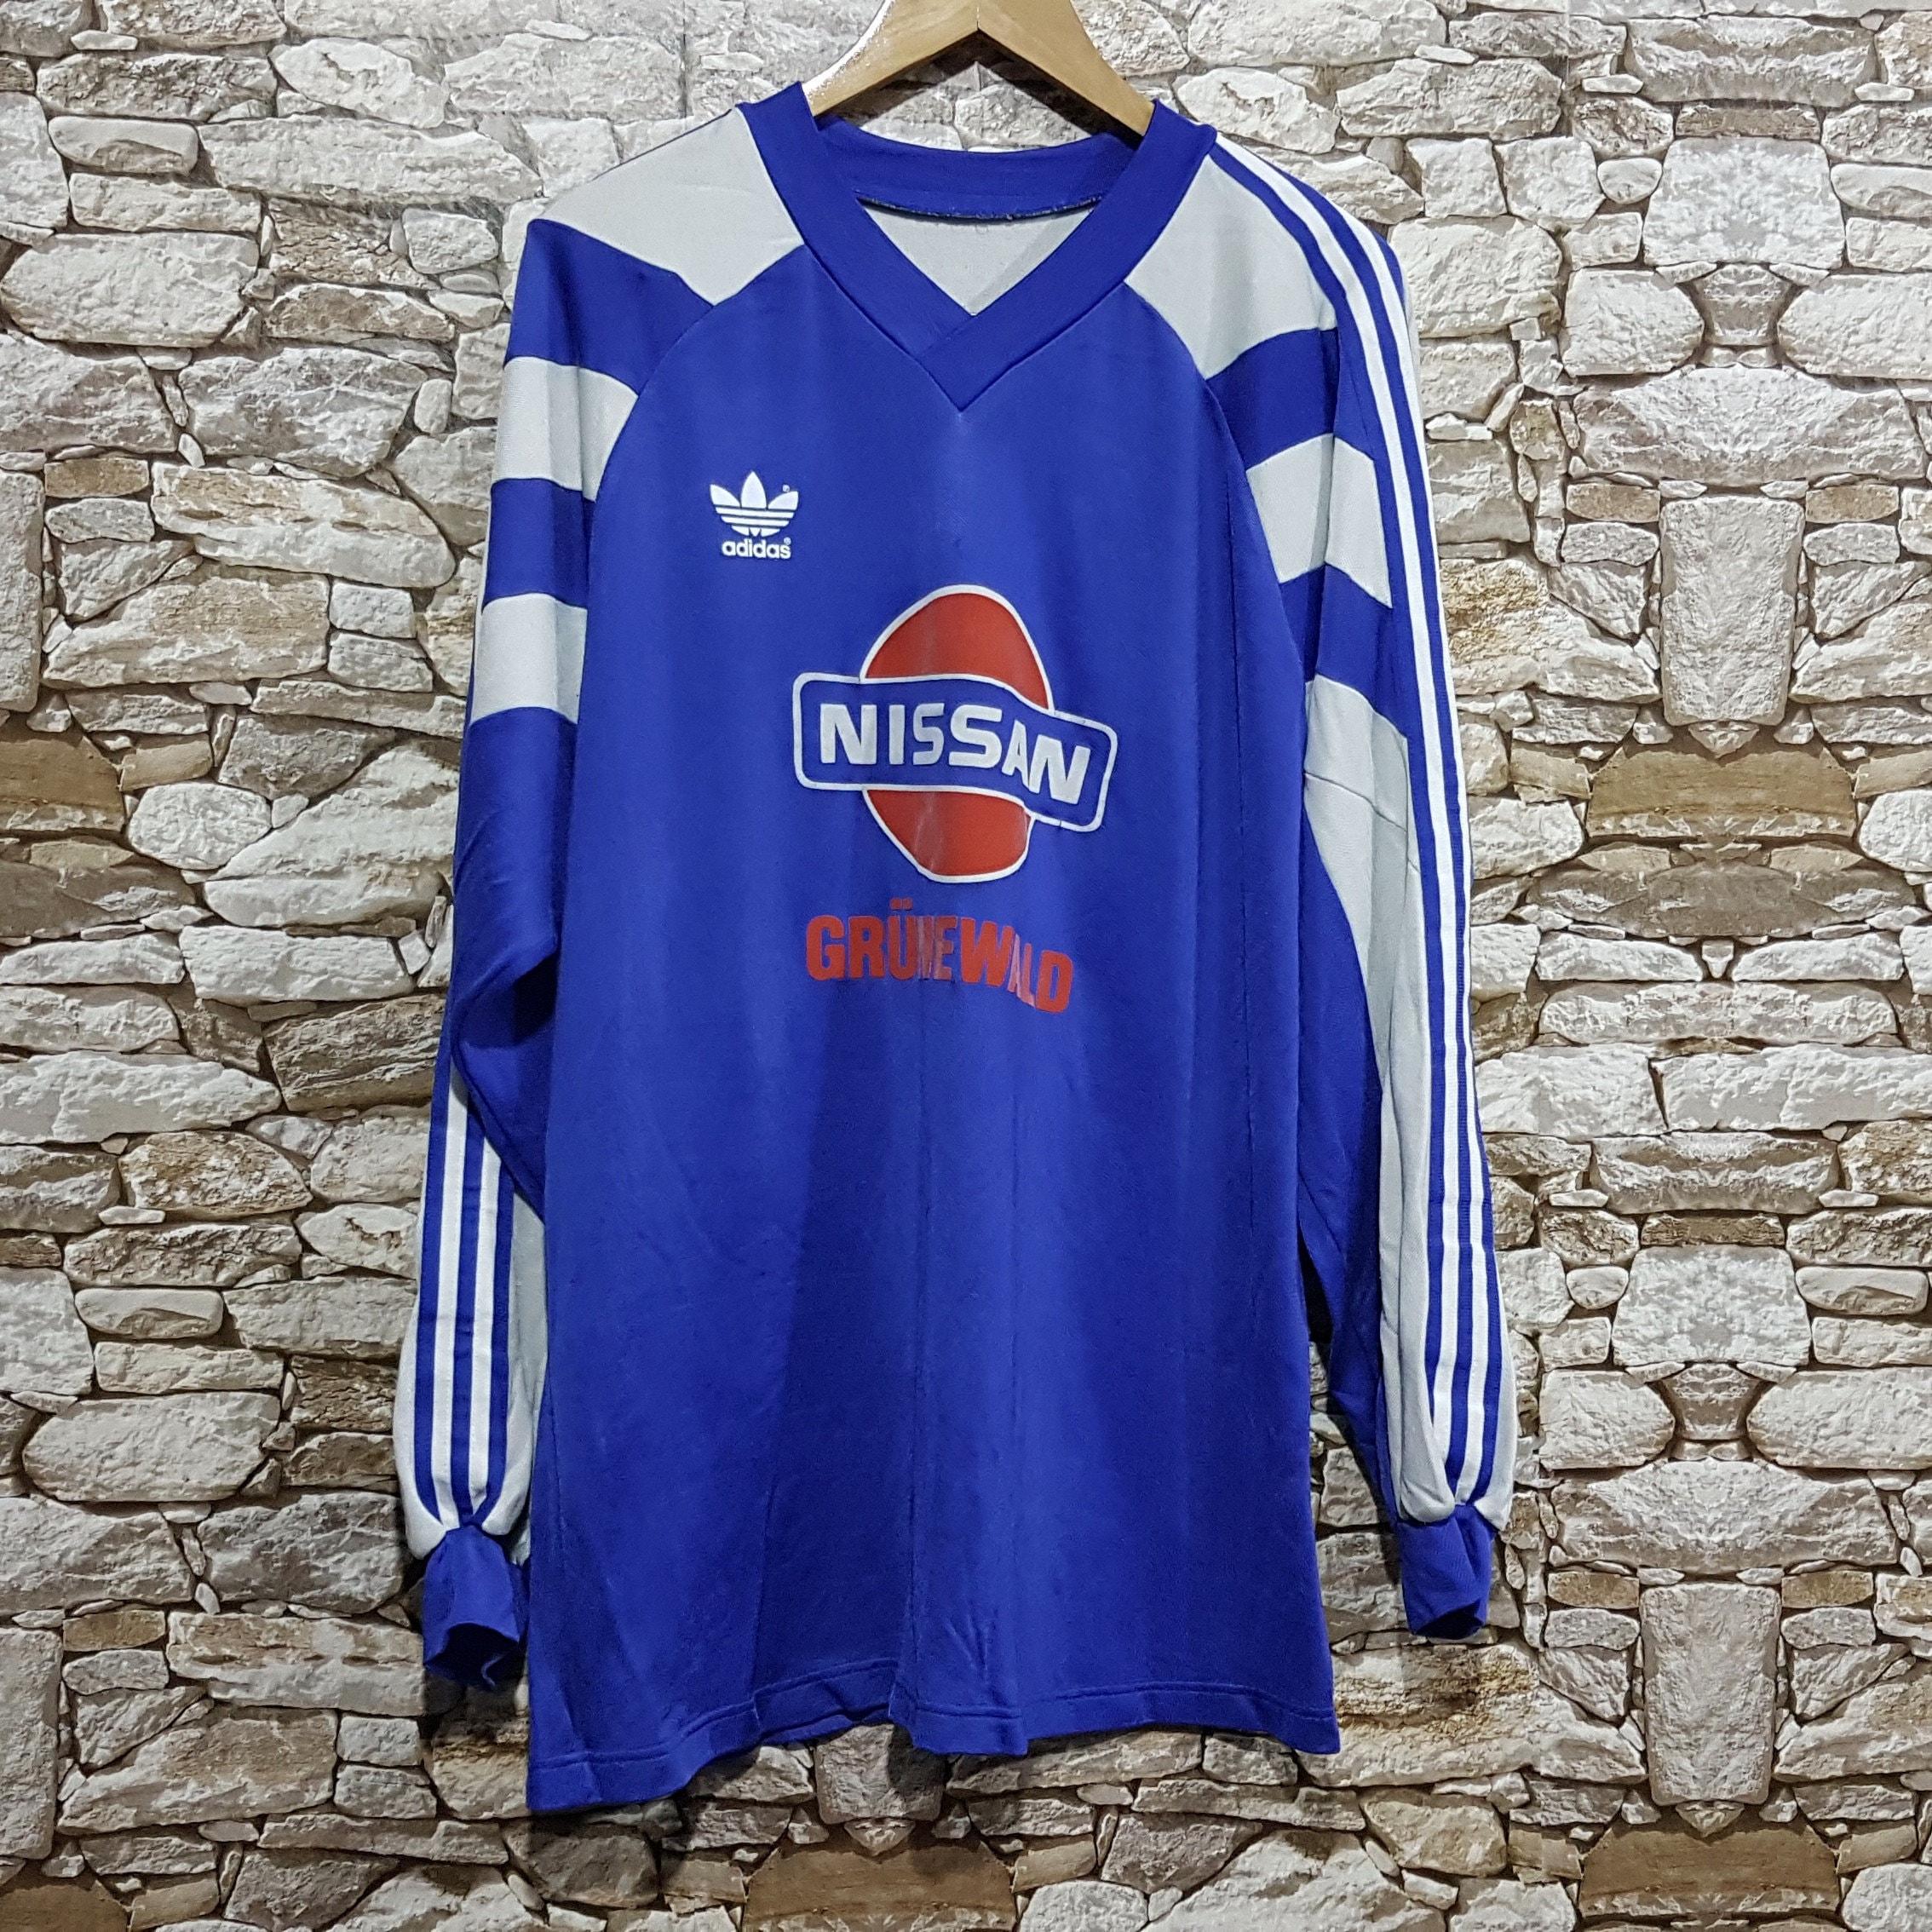 Vintage 90s Adidas NISSAN old school retro shirt Tee men size: XL/Adidas jersey football sweatshirt/Vintage Clothing men